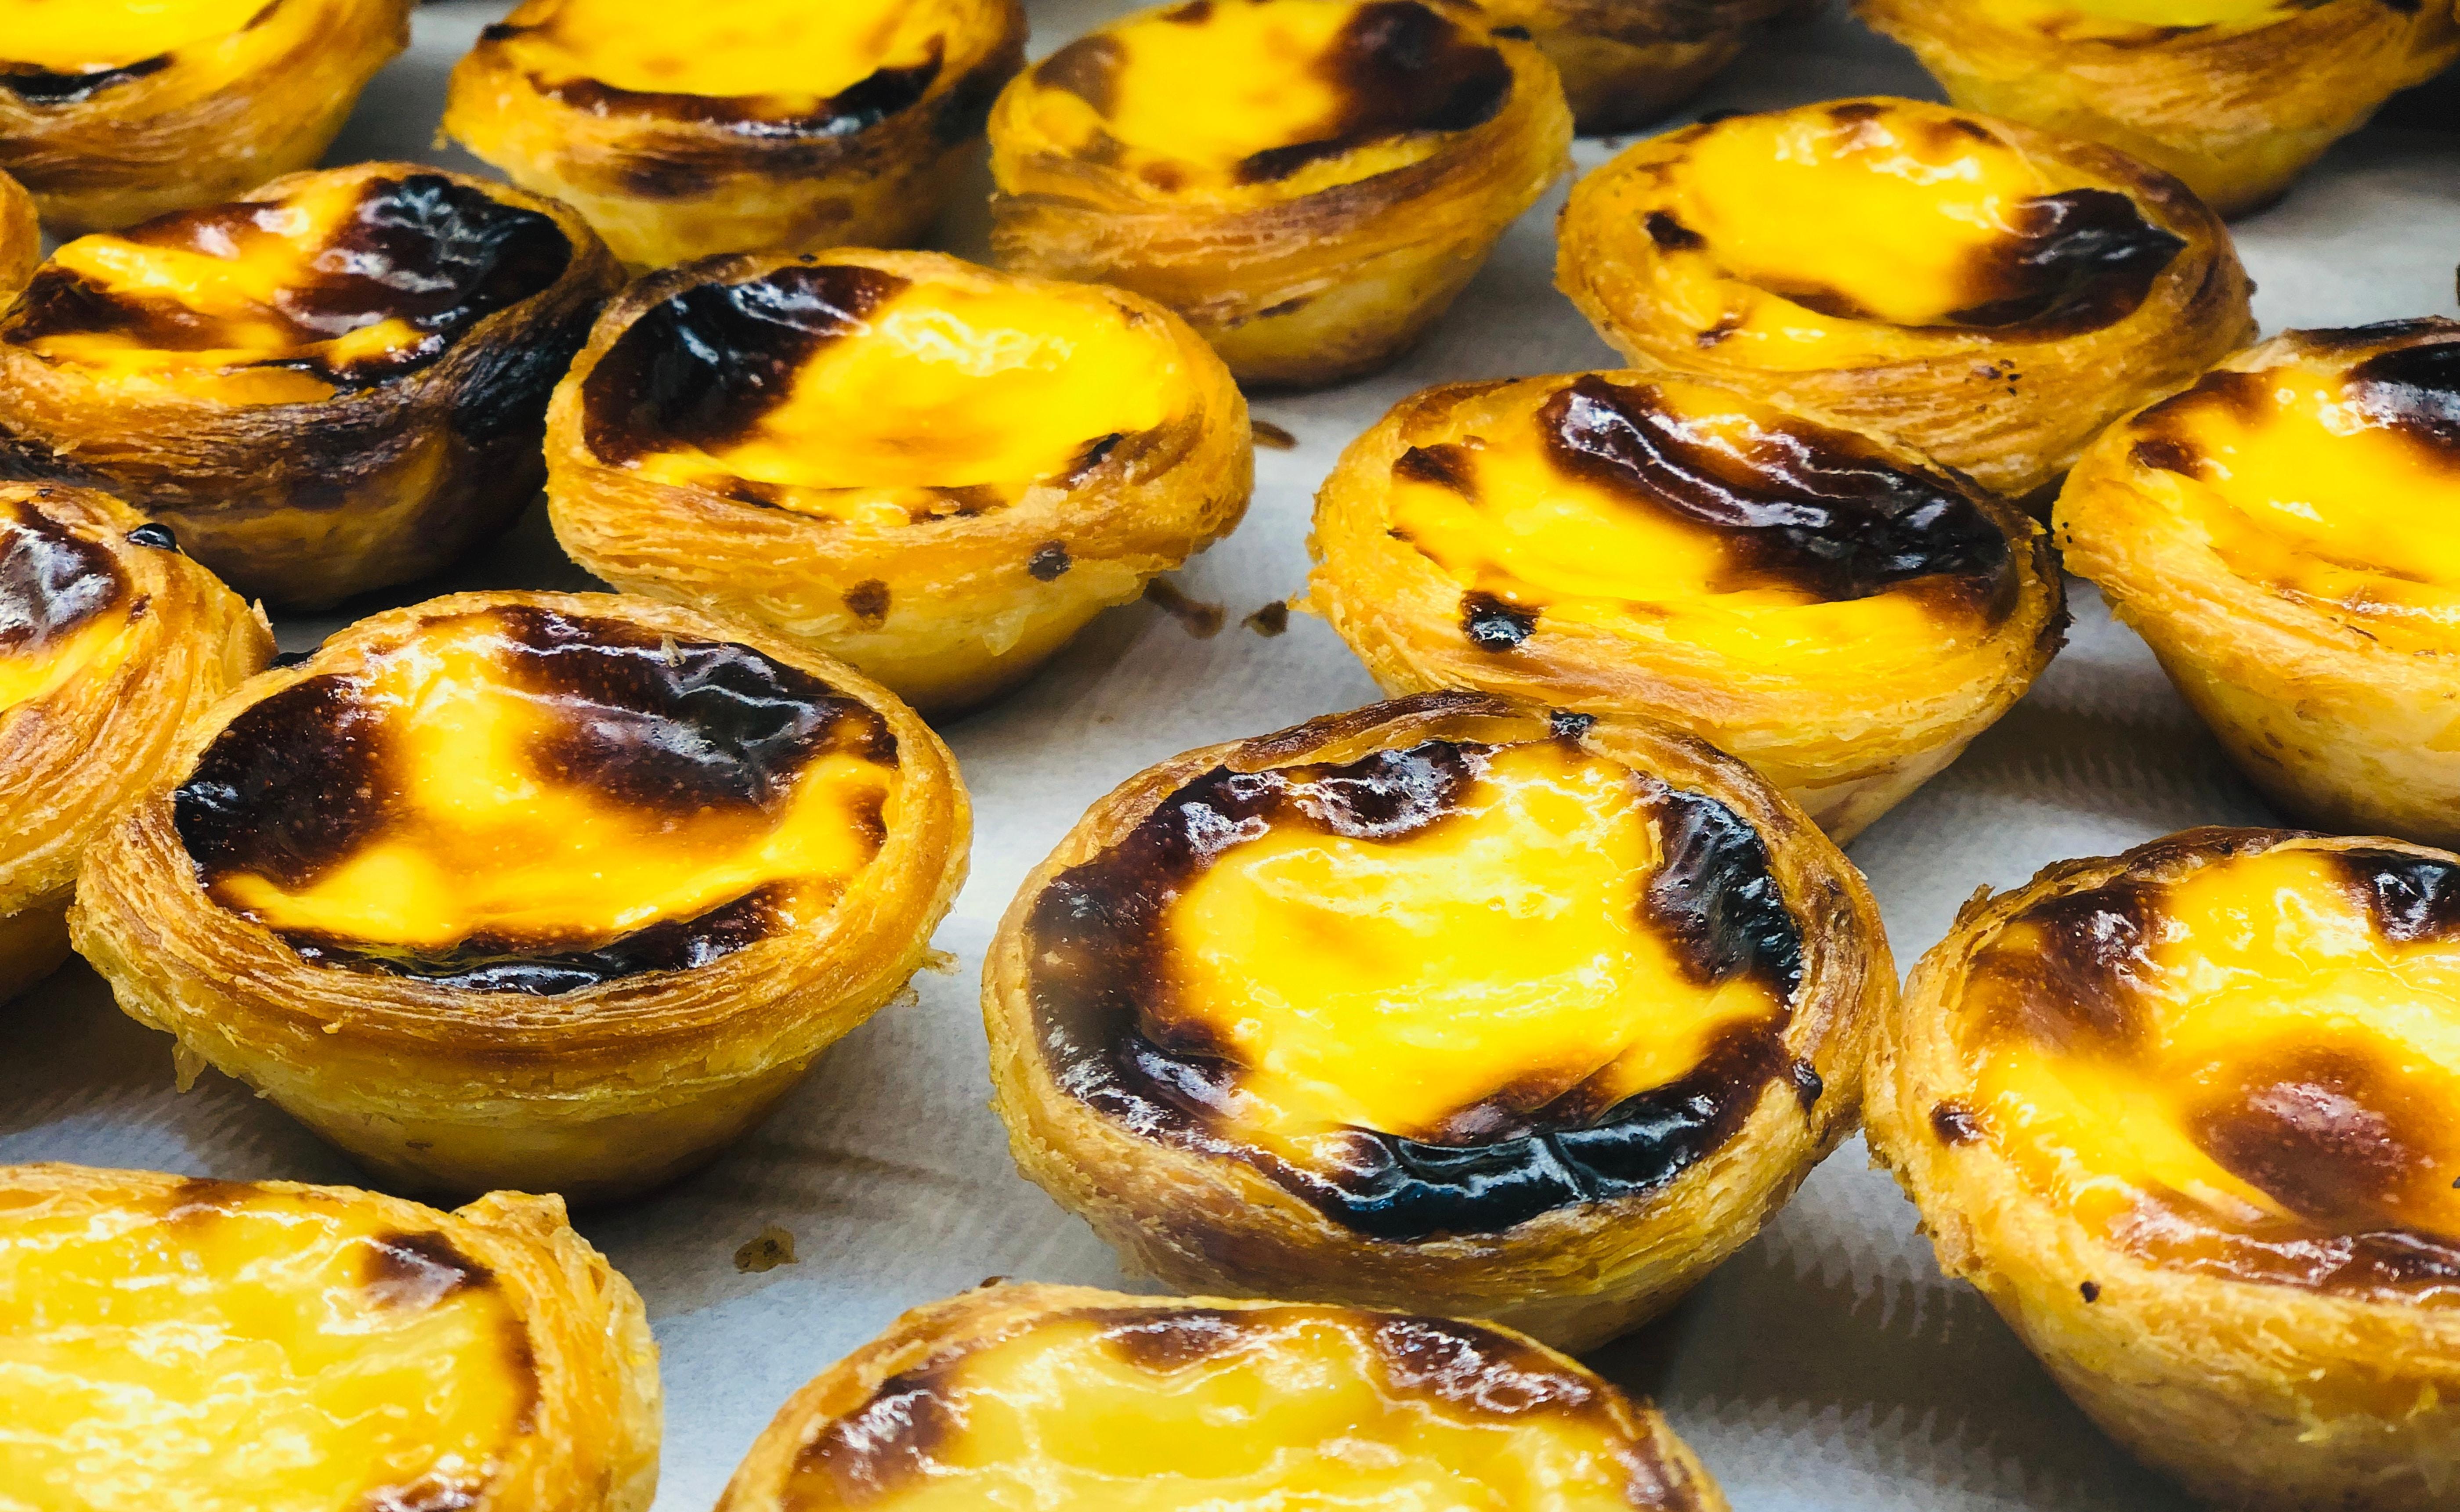 pastel de nata | romantic things to do in lisbon